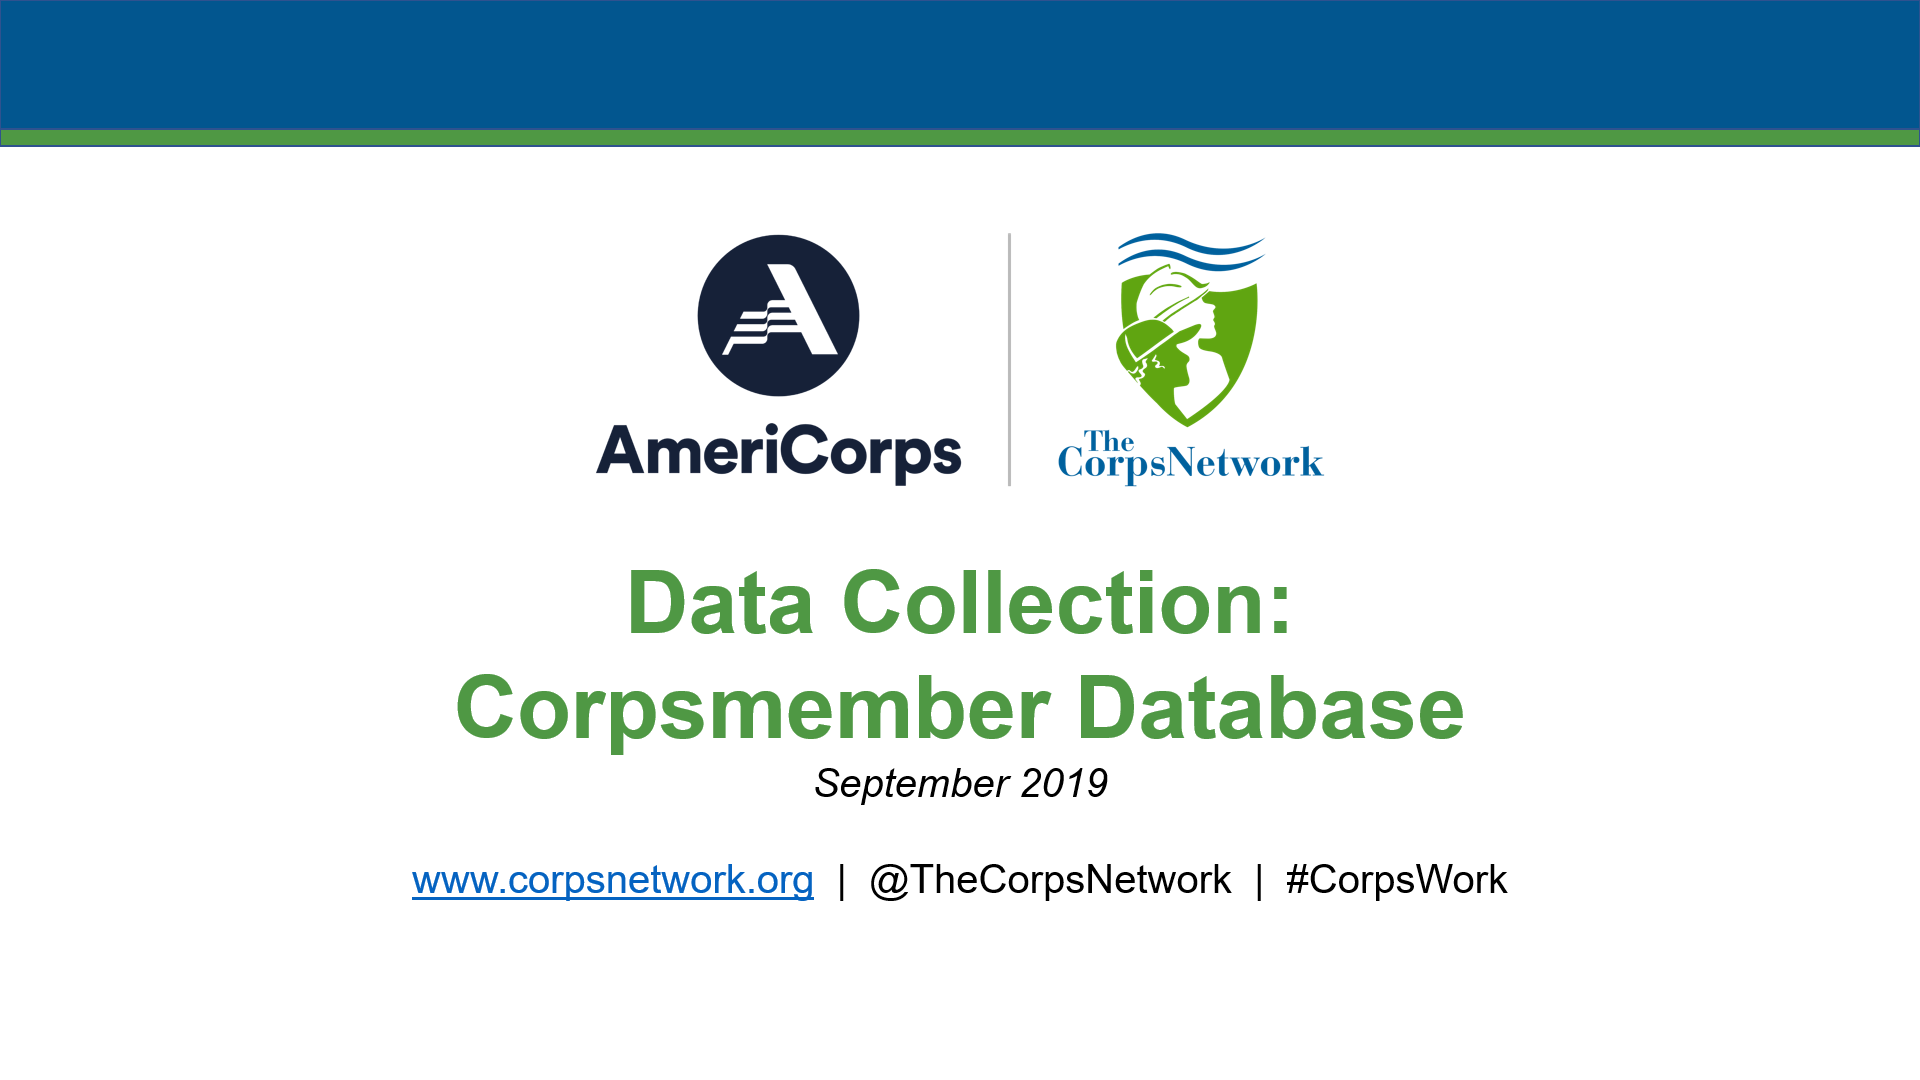 Corpsmember Database Tutorial